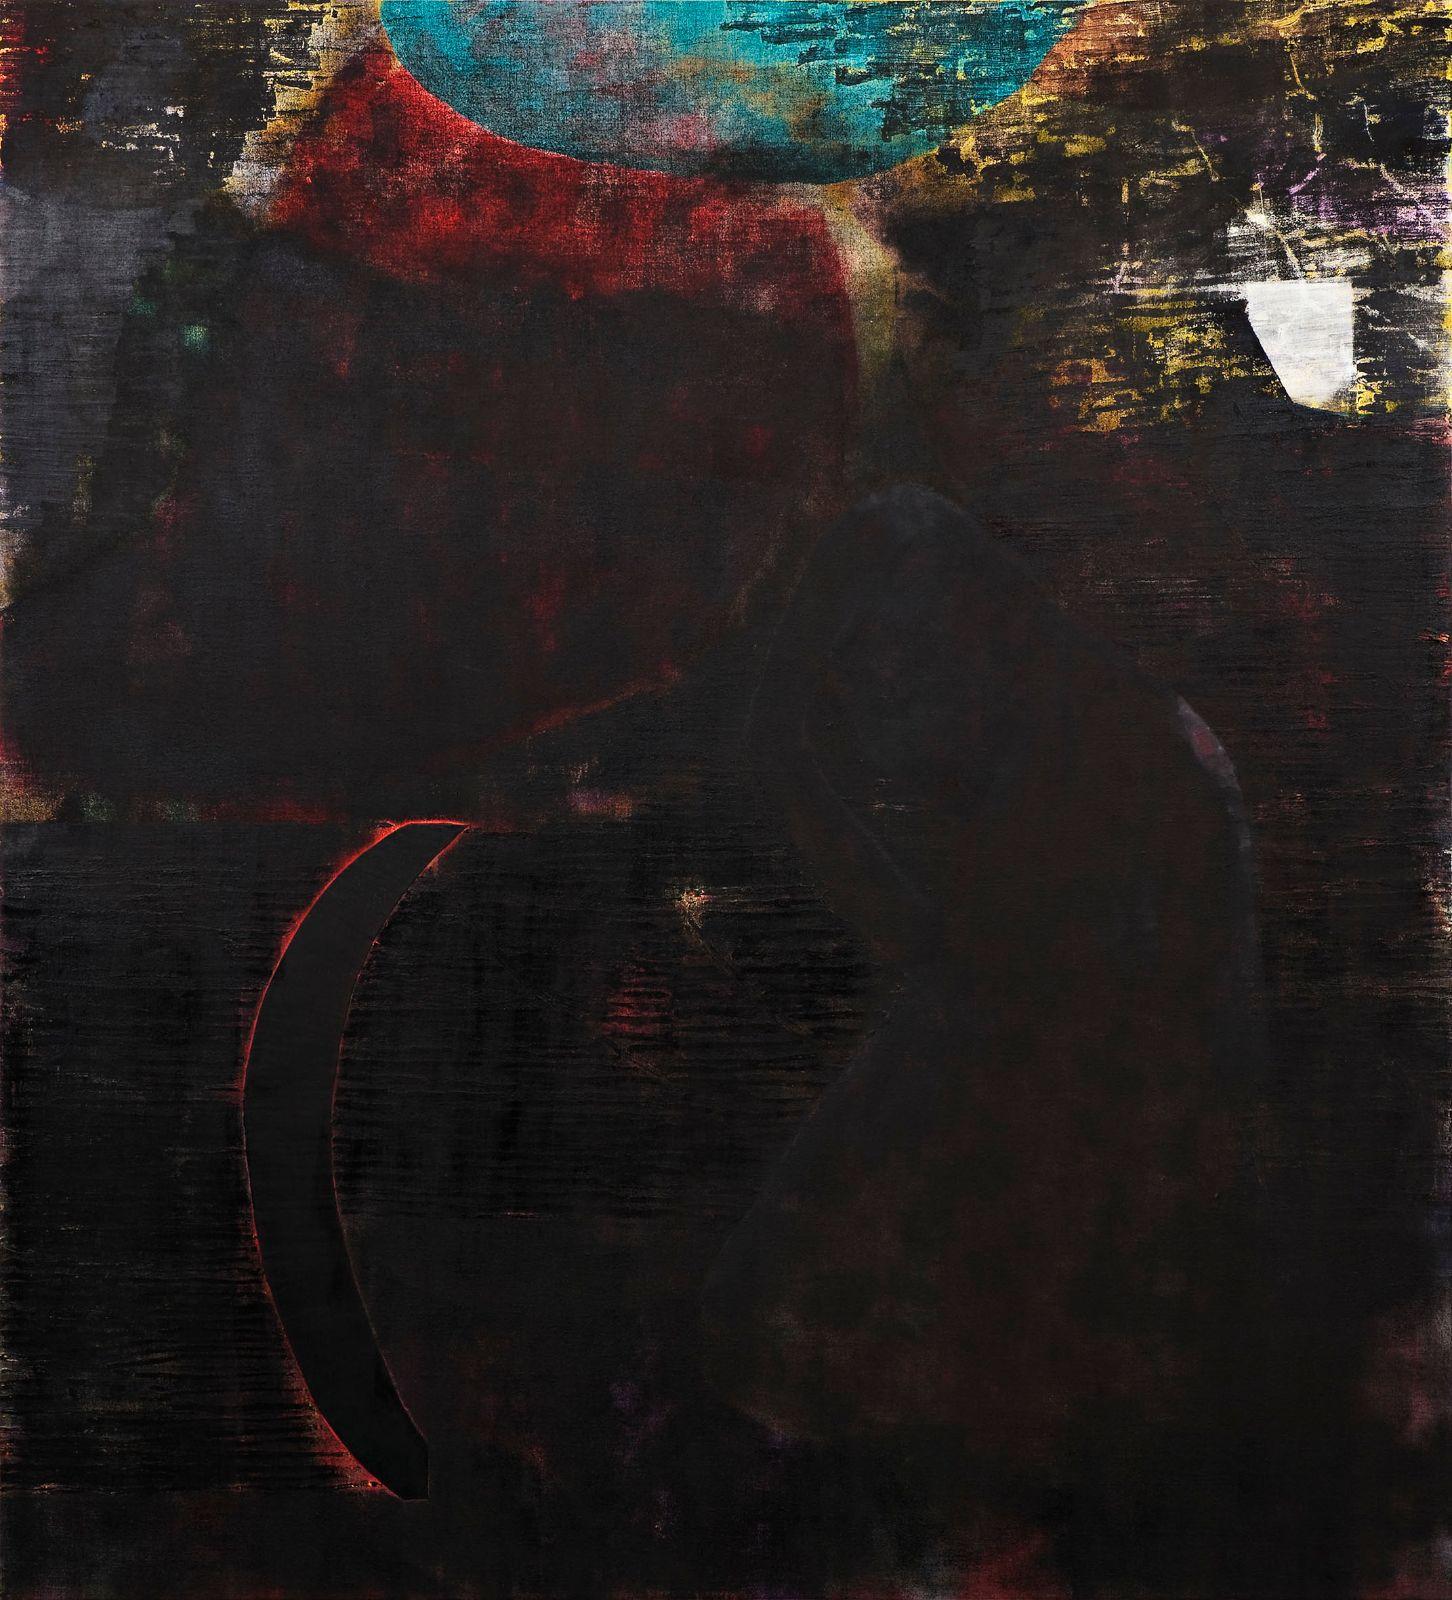 Bysantinisme, 2009, oil on canvas on panel, 180 x 165 cm